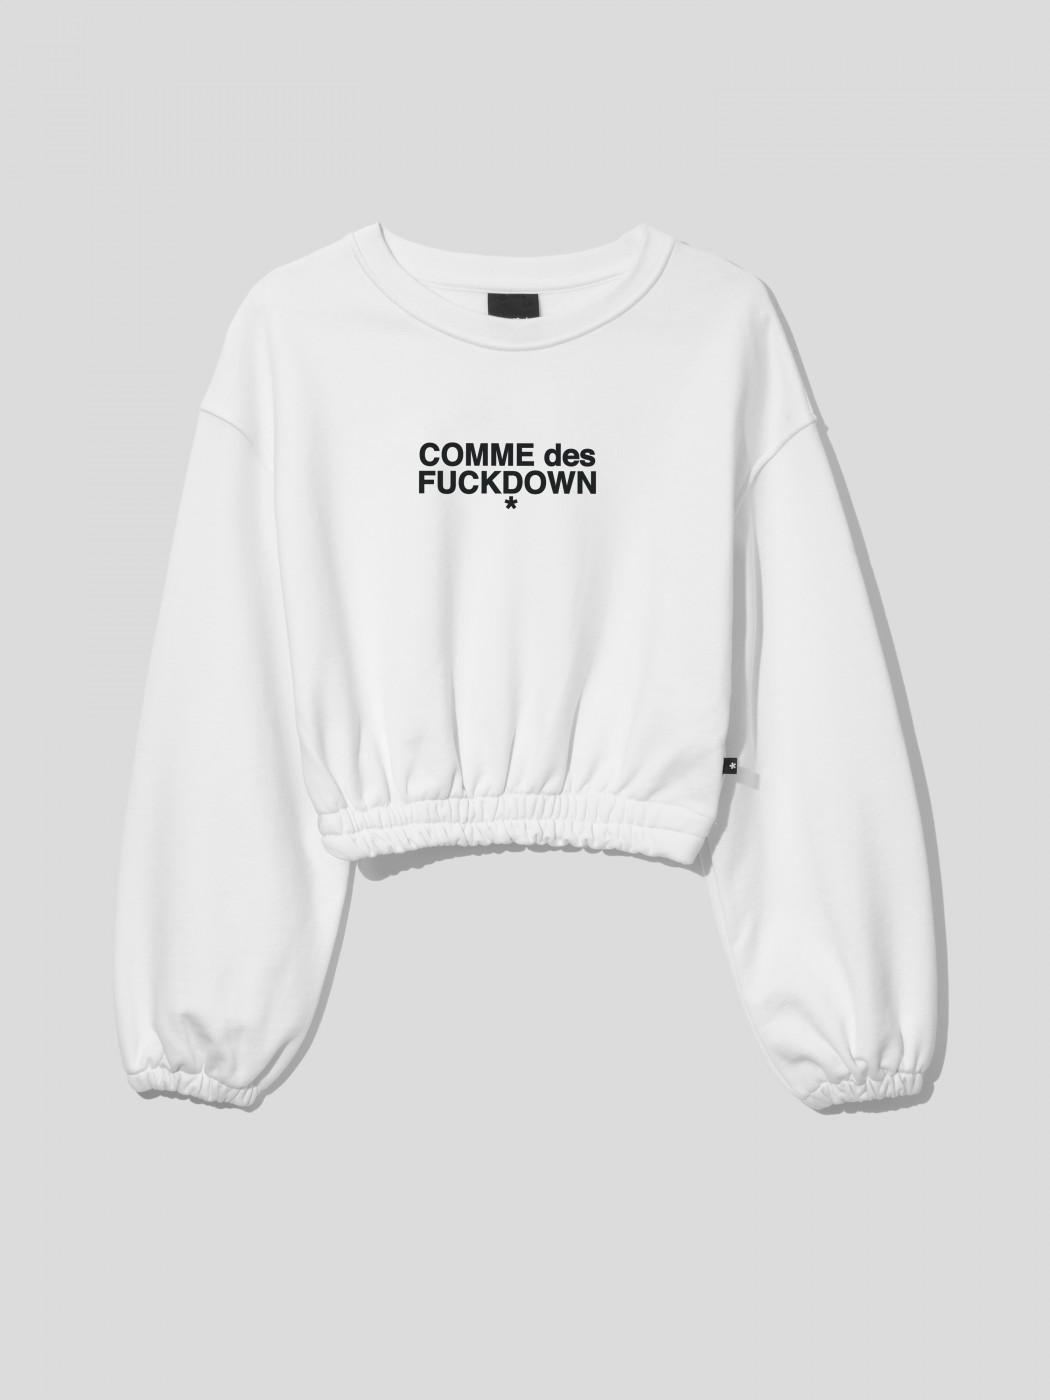 SWEATSHIRT - CDFD1539 - COMME DES FKDOWN